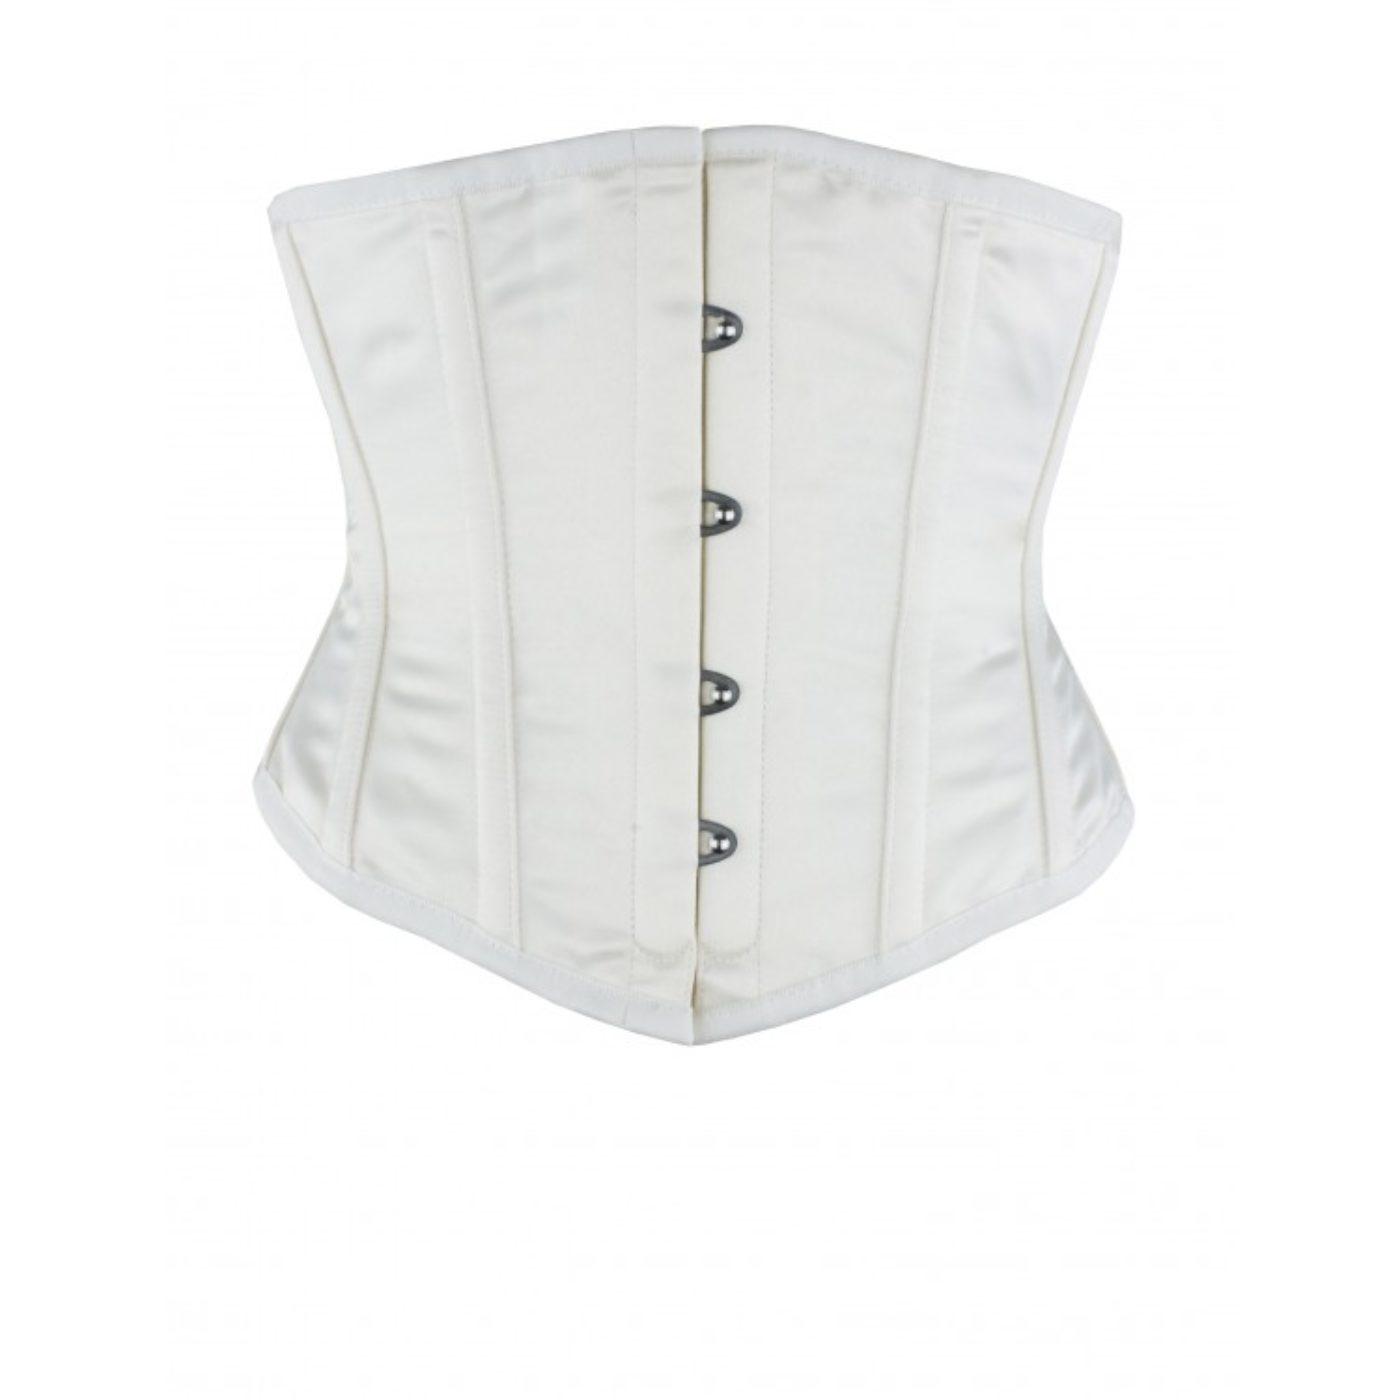 Ivory Satin Underbust wedding corset